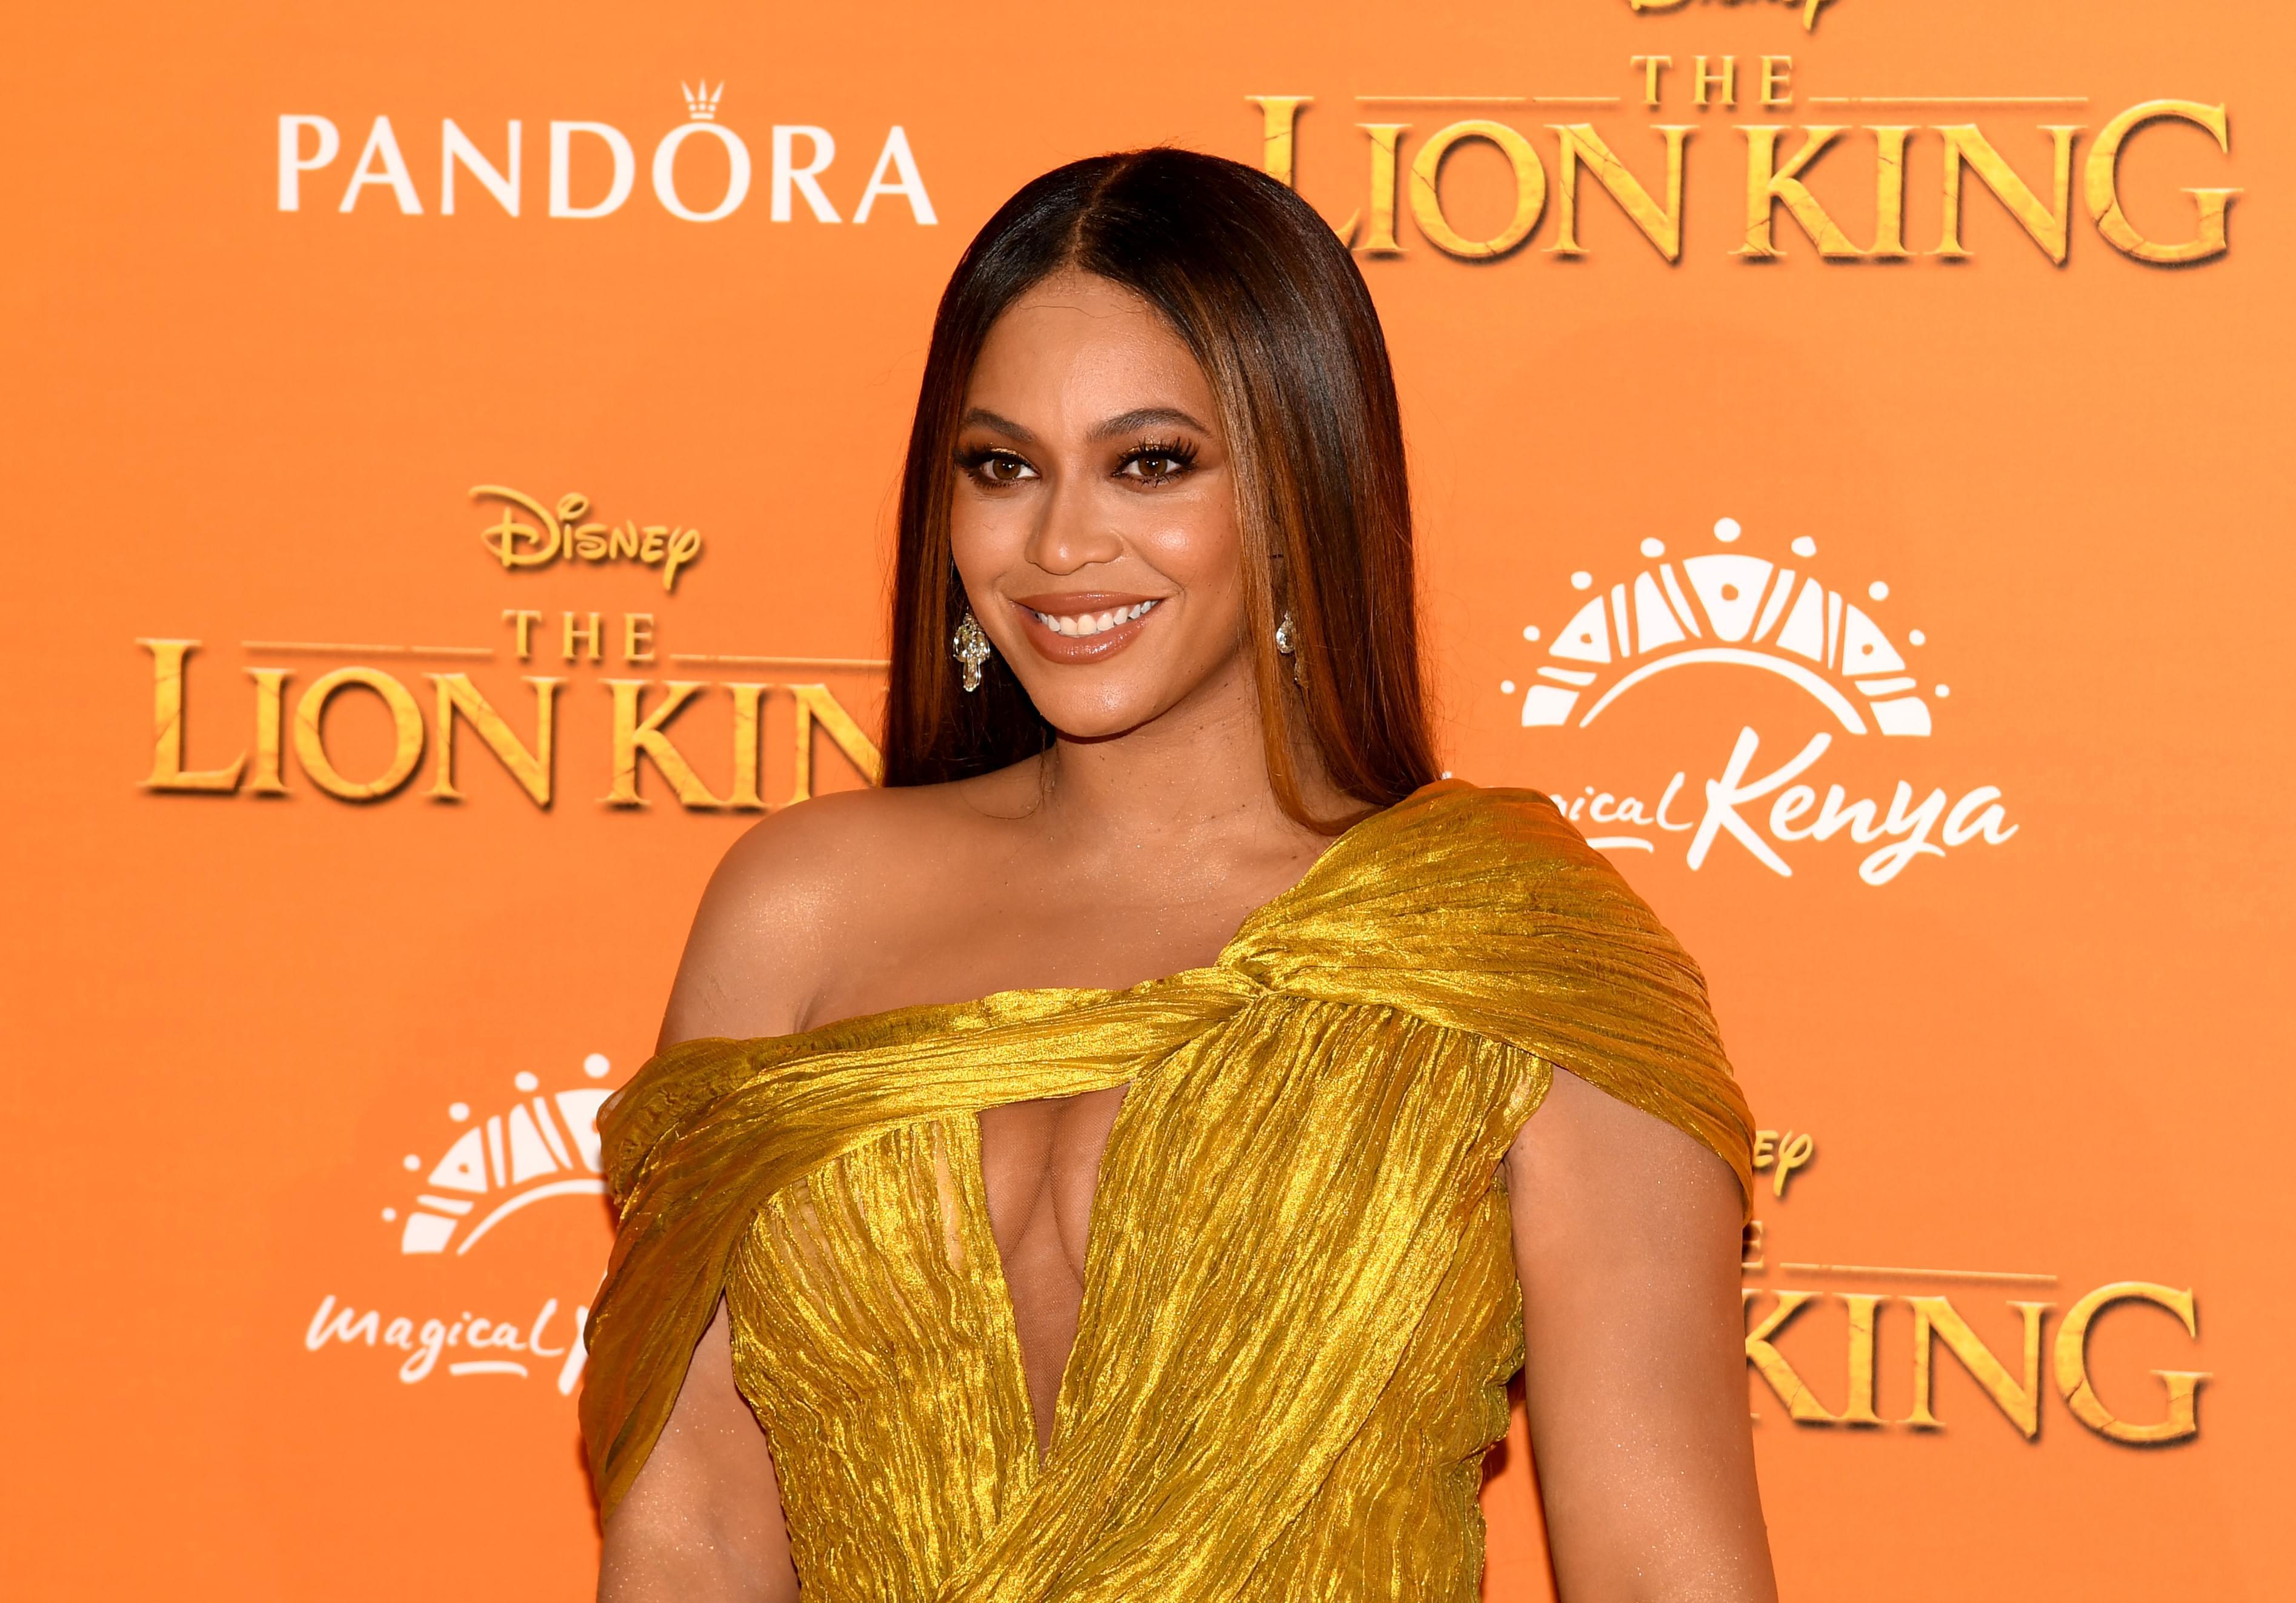 Beyonce's Wax Figure Gets A Glow Up